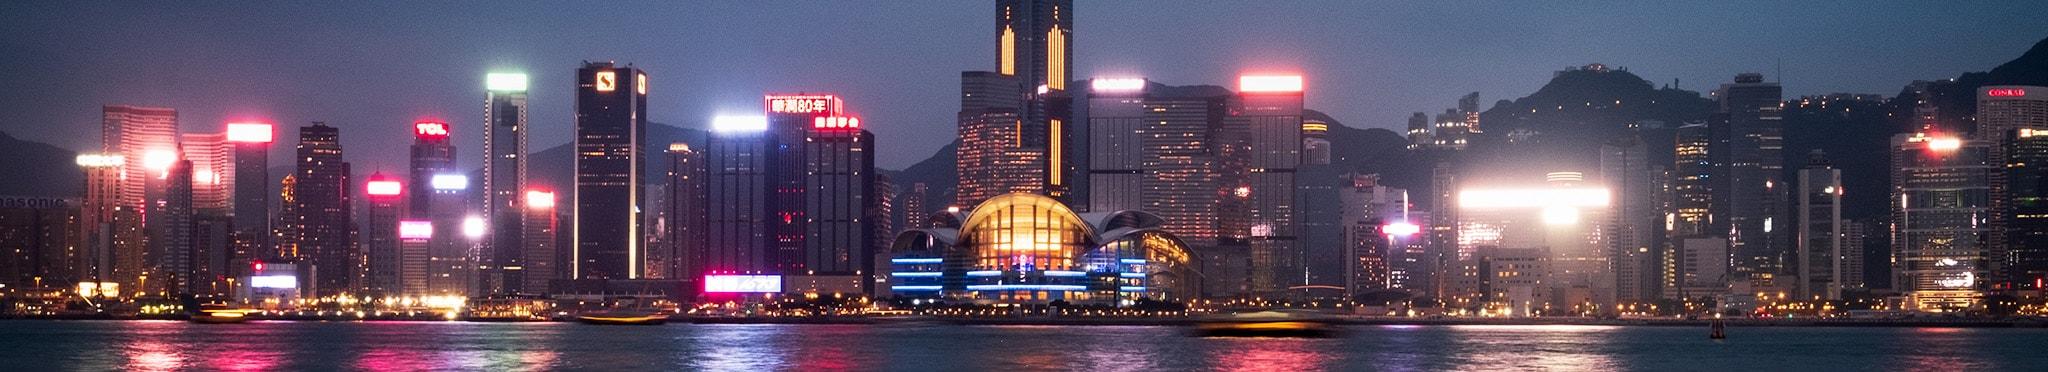 Азіатський Лас-Вегас <br>  Гонконг – Макао <br>2019 рік